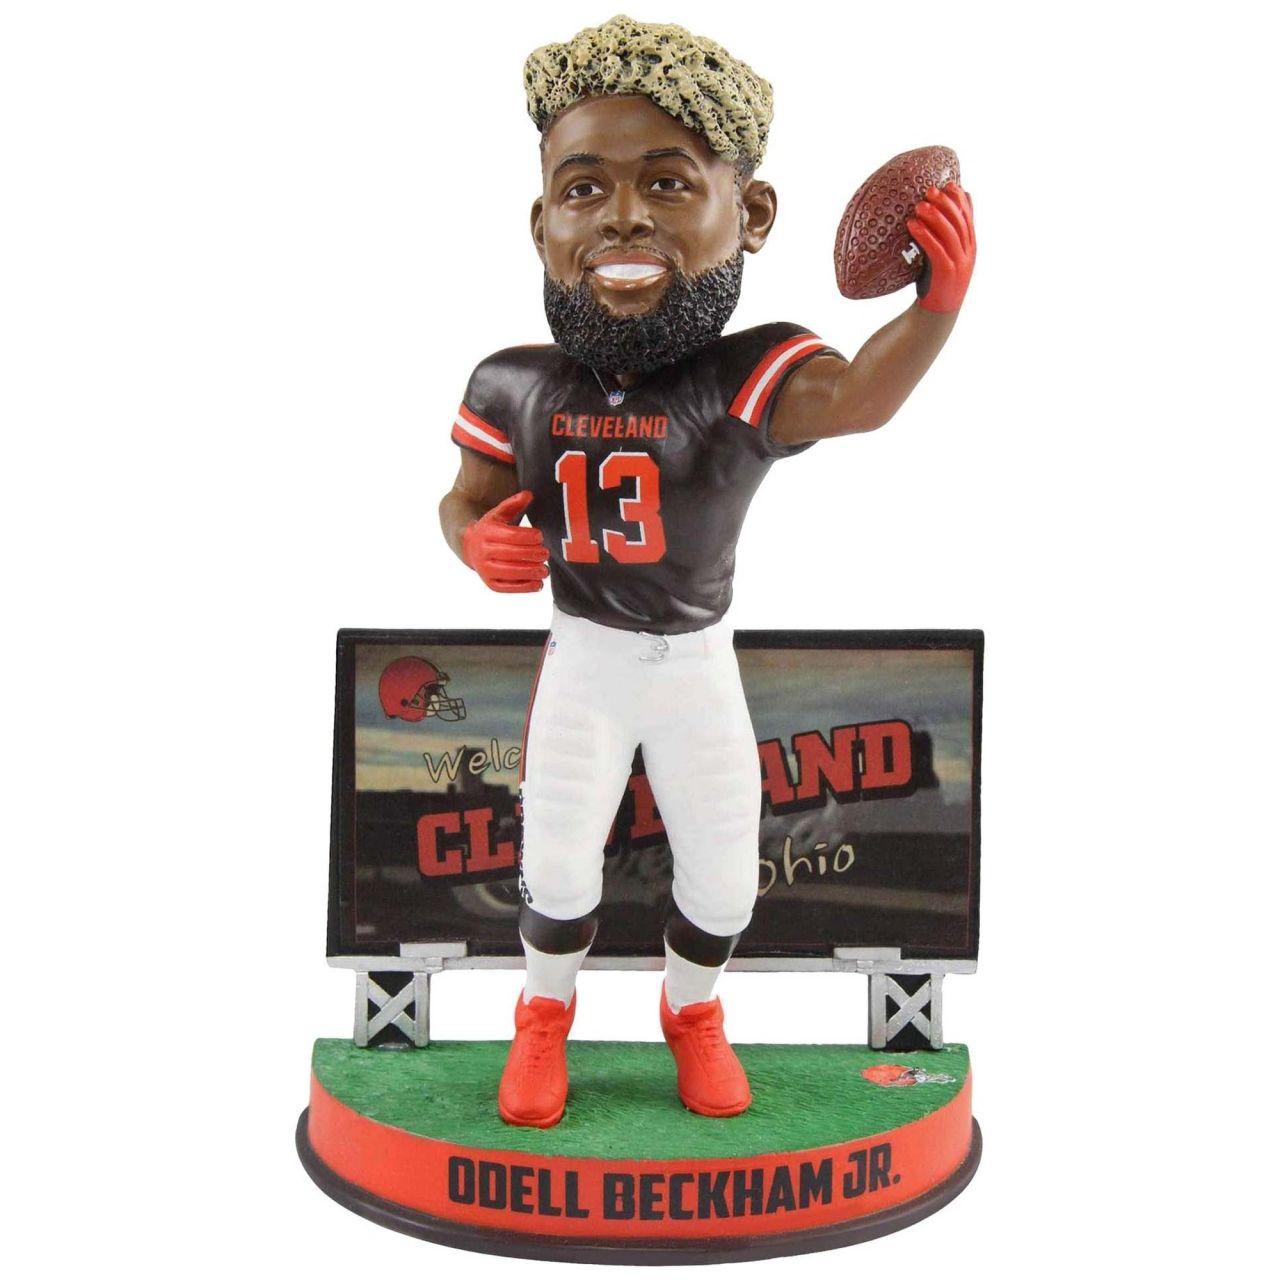 amfoo - Odell Beckham Jr. #13 Bobblehead Cleveland Browns Billboard